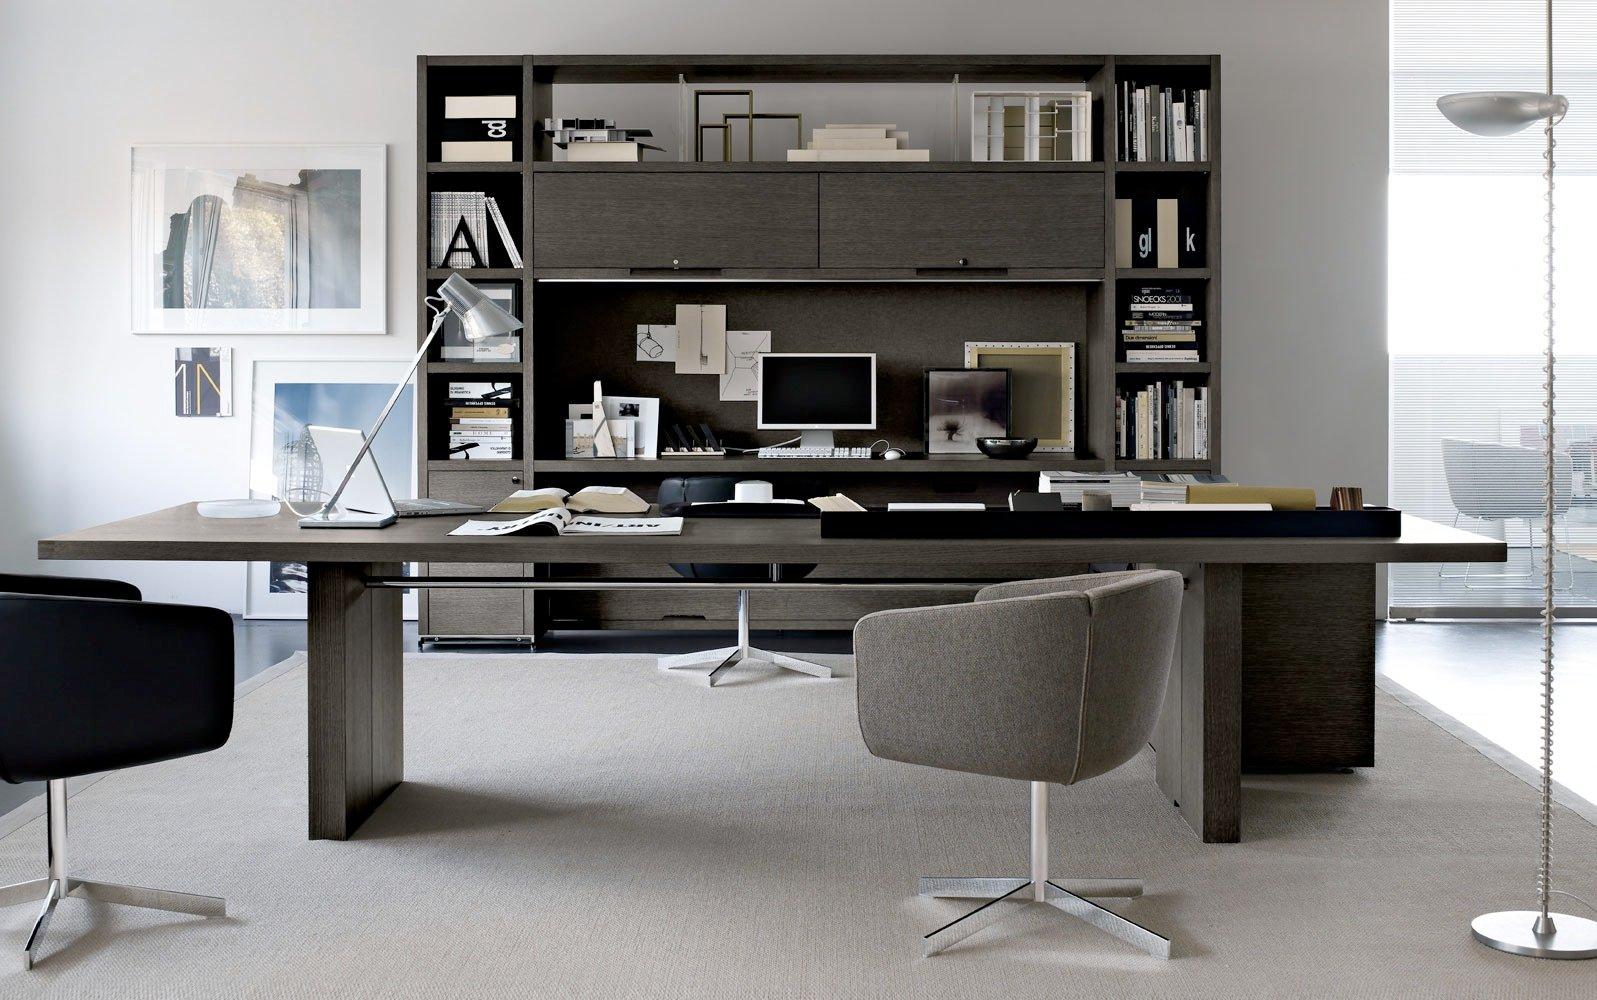 Mobiliario de oficina de dise o y moderno en gunni trentino for Mobiliario de oficina de diseno